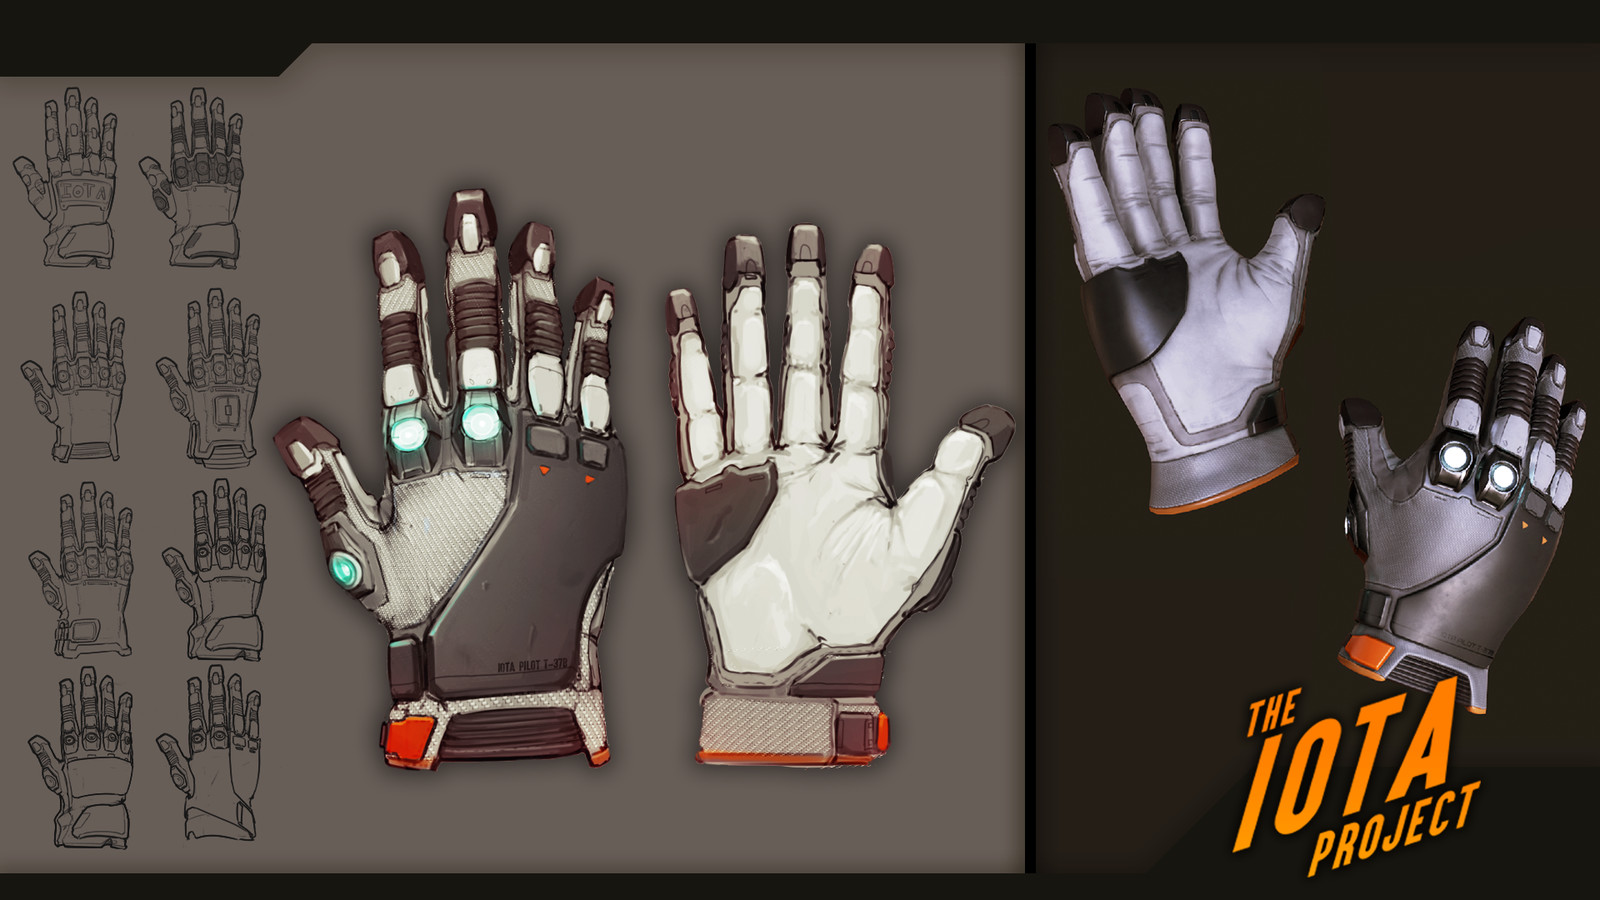 Glove concept. Model by Brenton Goodwin